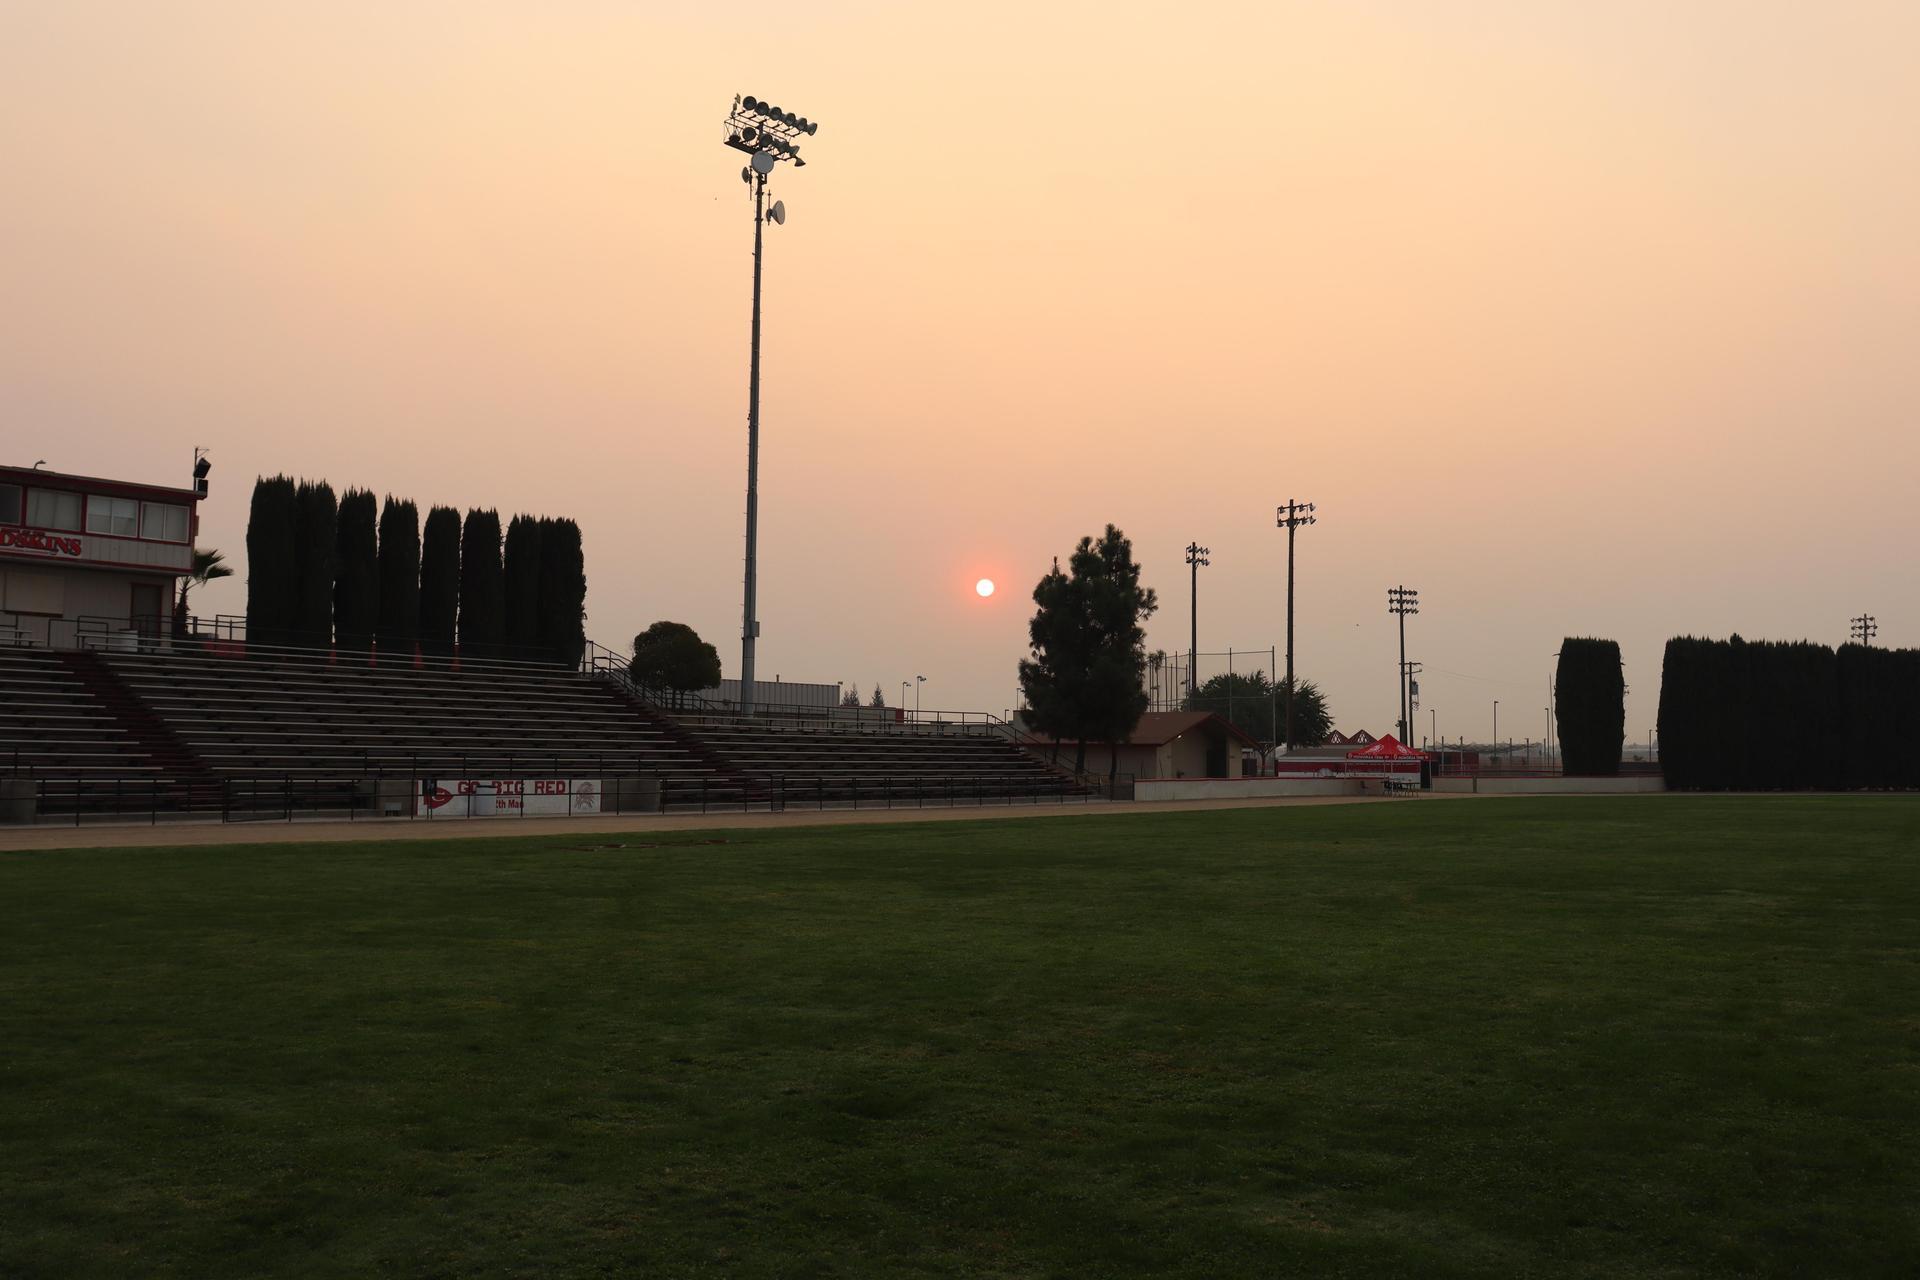 sunrise through the smoke